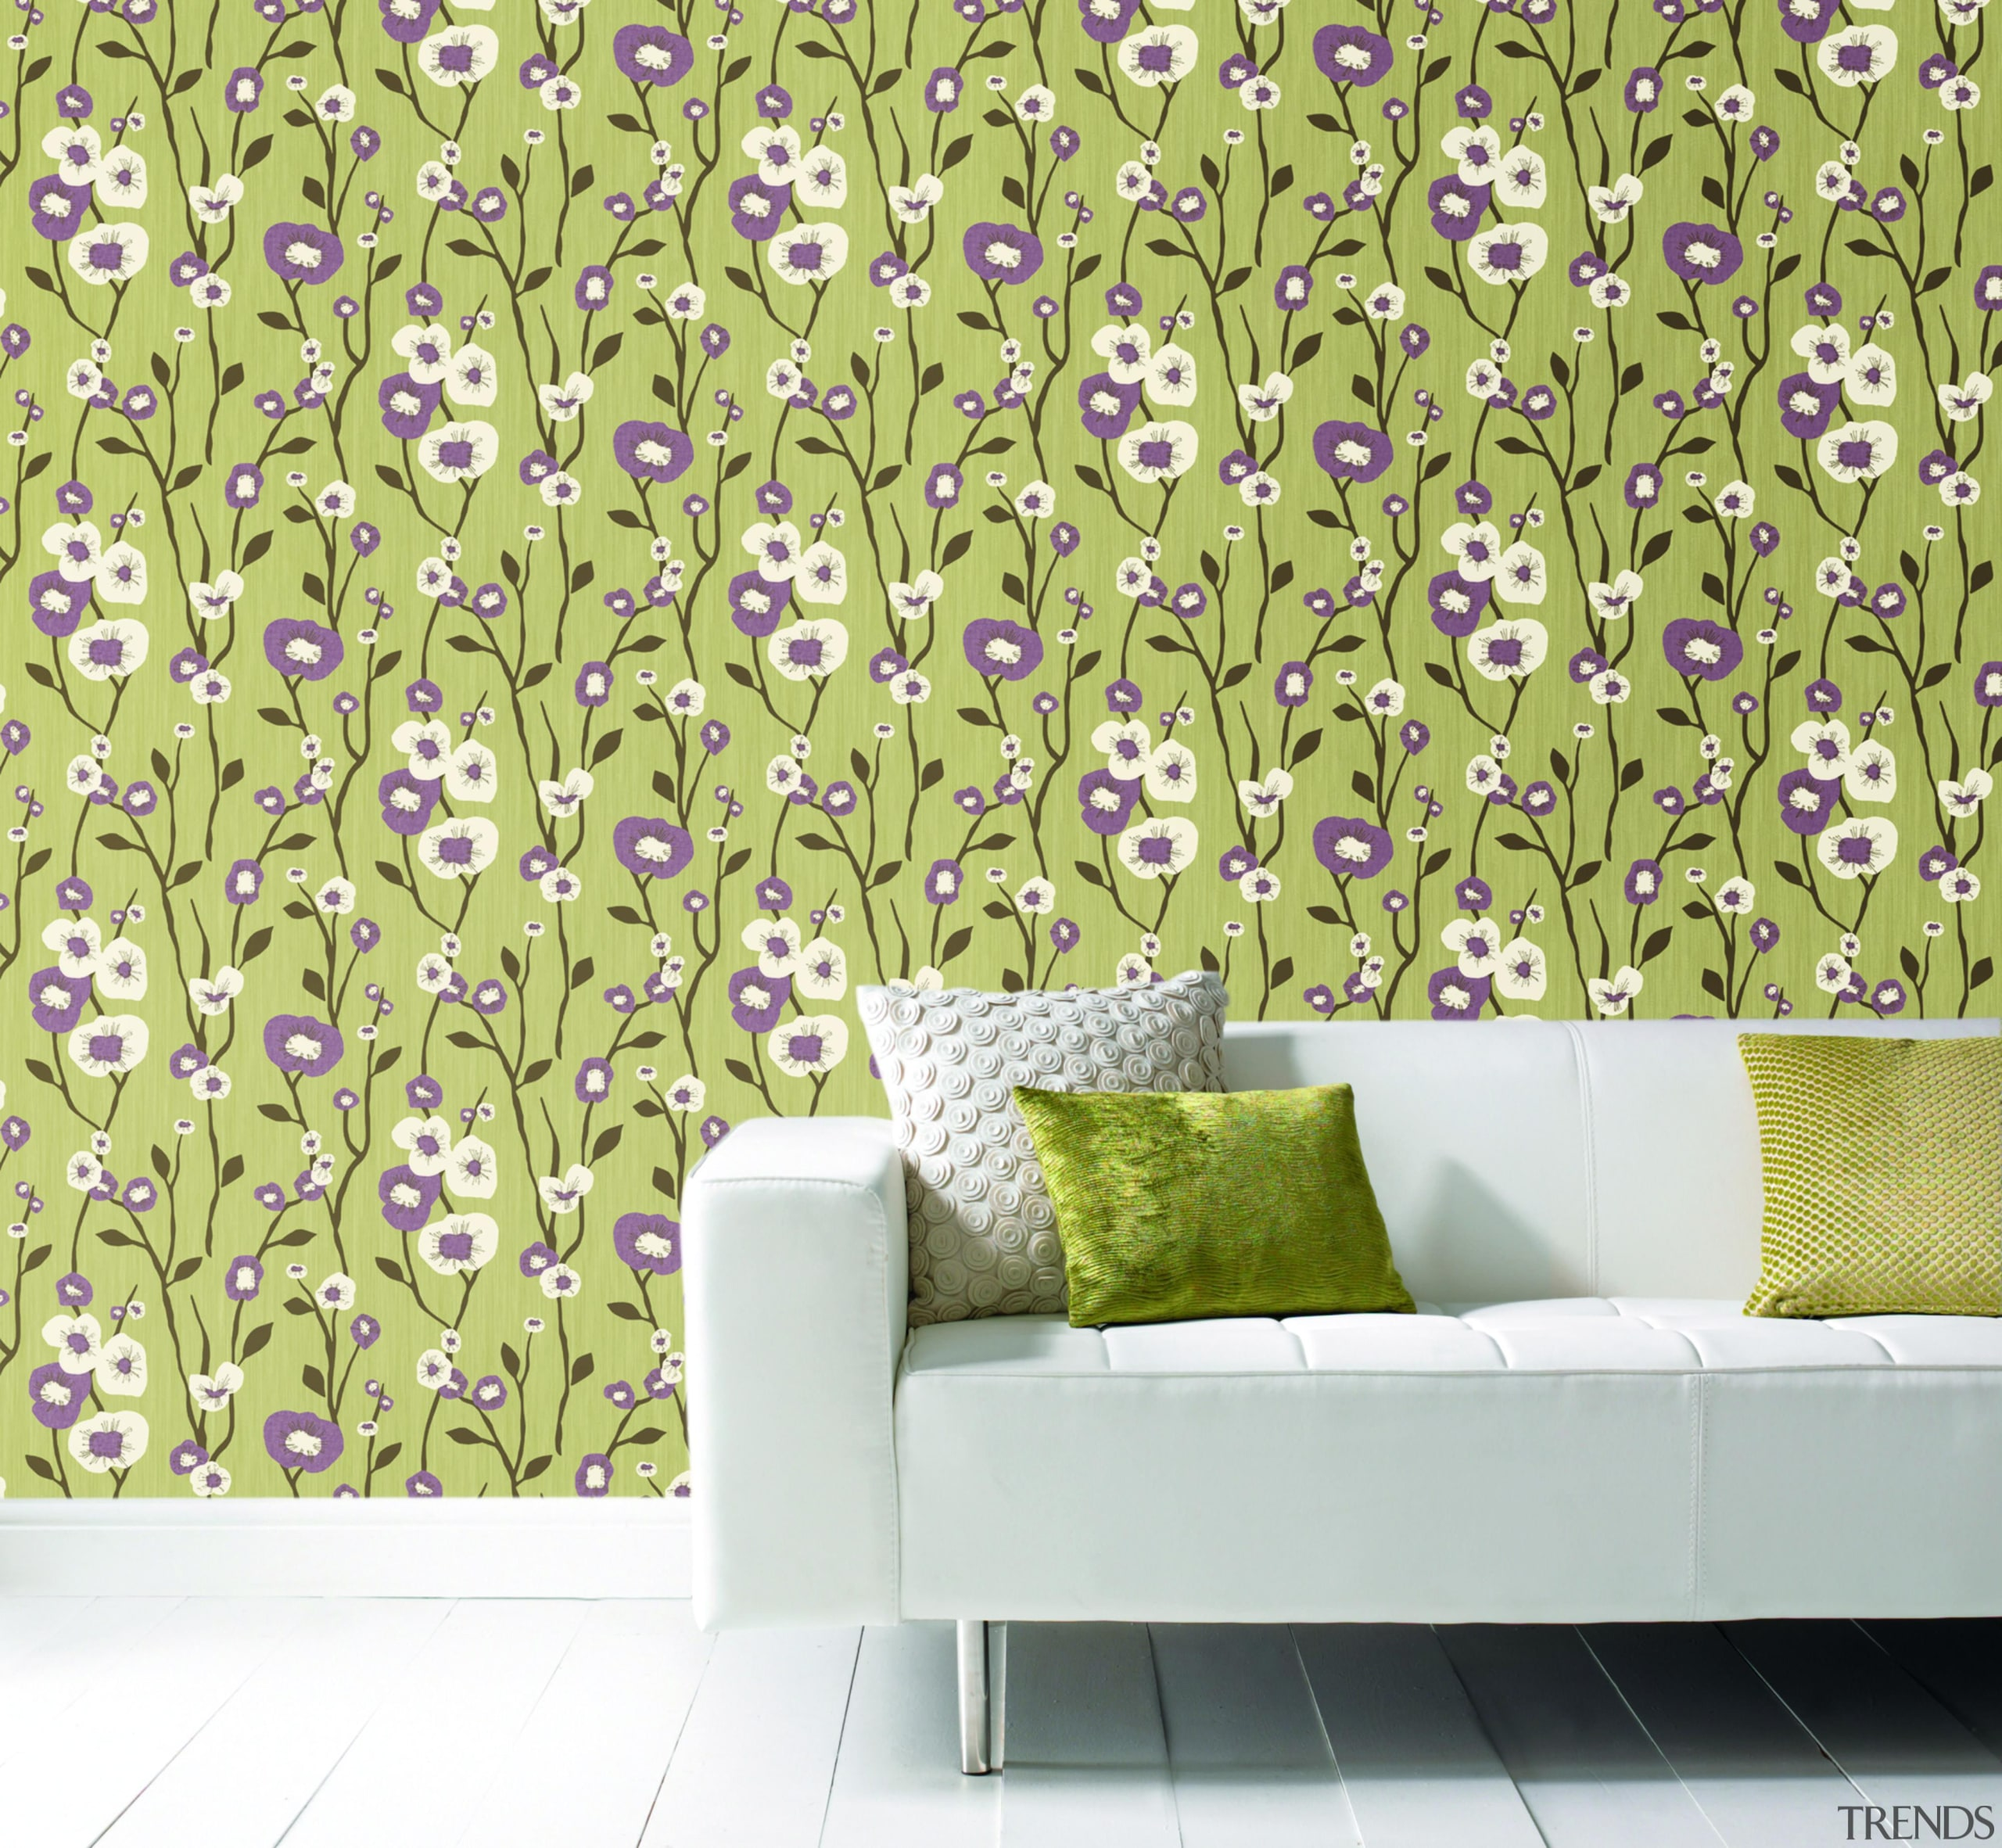 Modern Style Range - Modern Style Range - flora, green, interior design, pattern, purple, wall, wallpaper, yellow, white